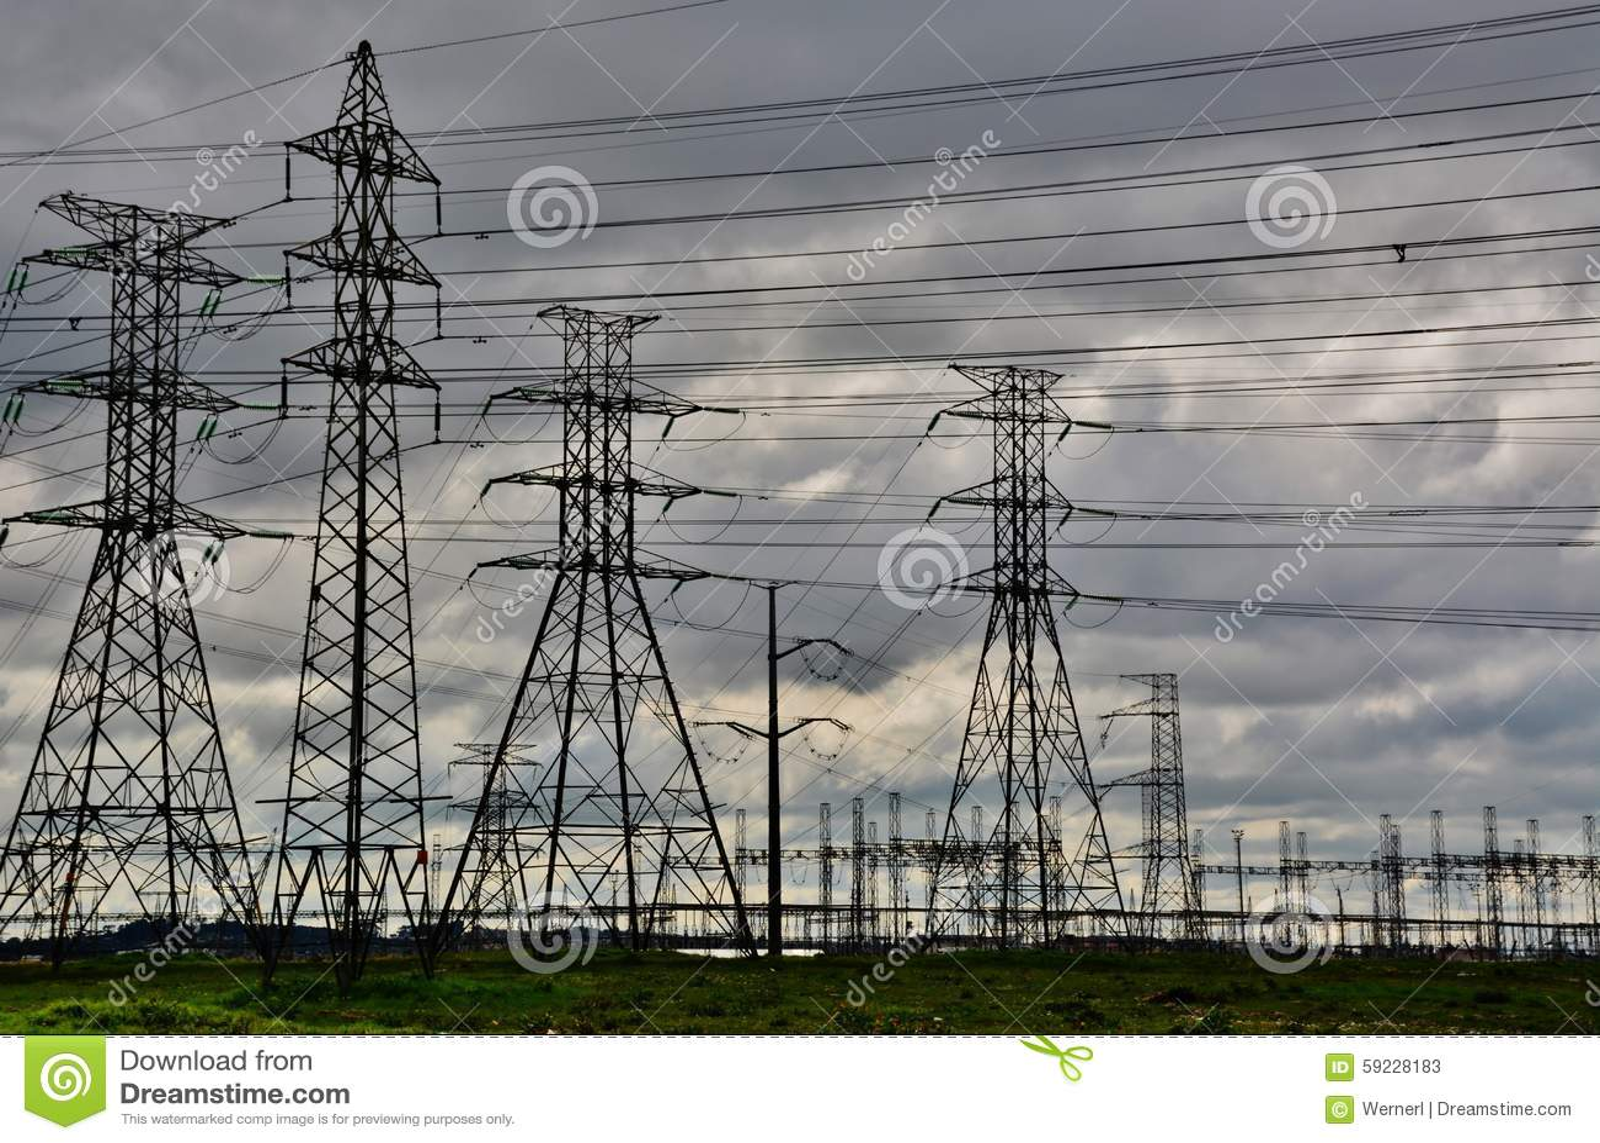 Download Líneas eléctricas imagen de archivo. Imagen de paisaje - 59228183